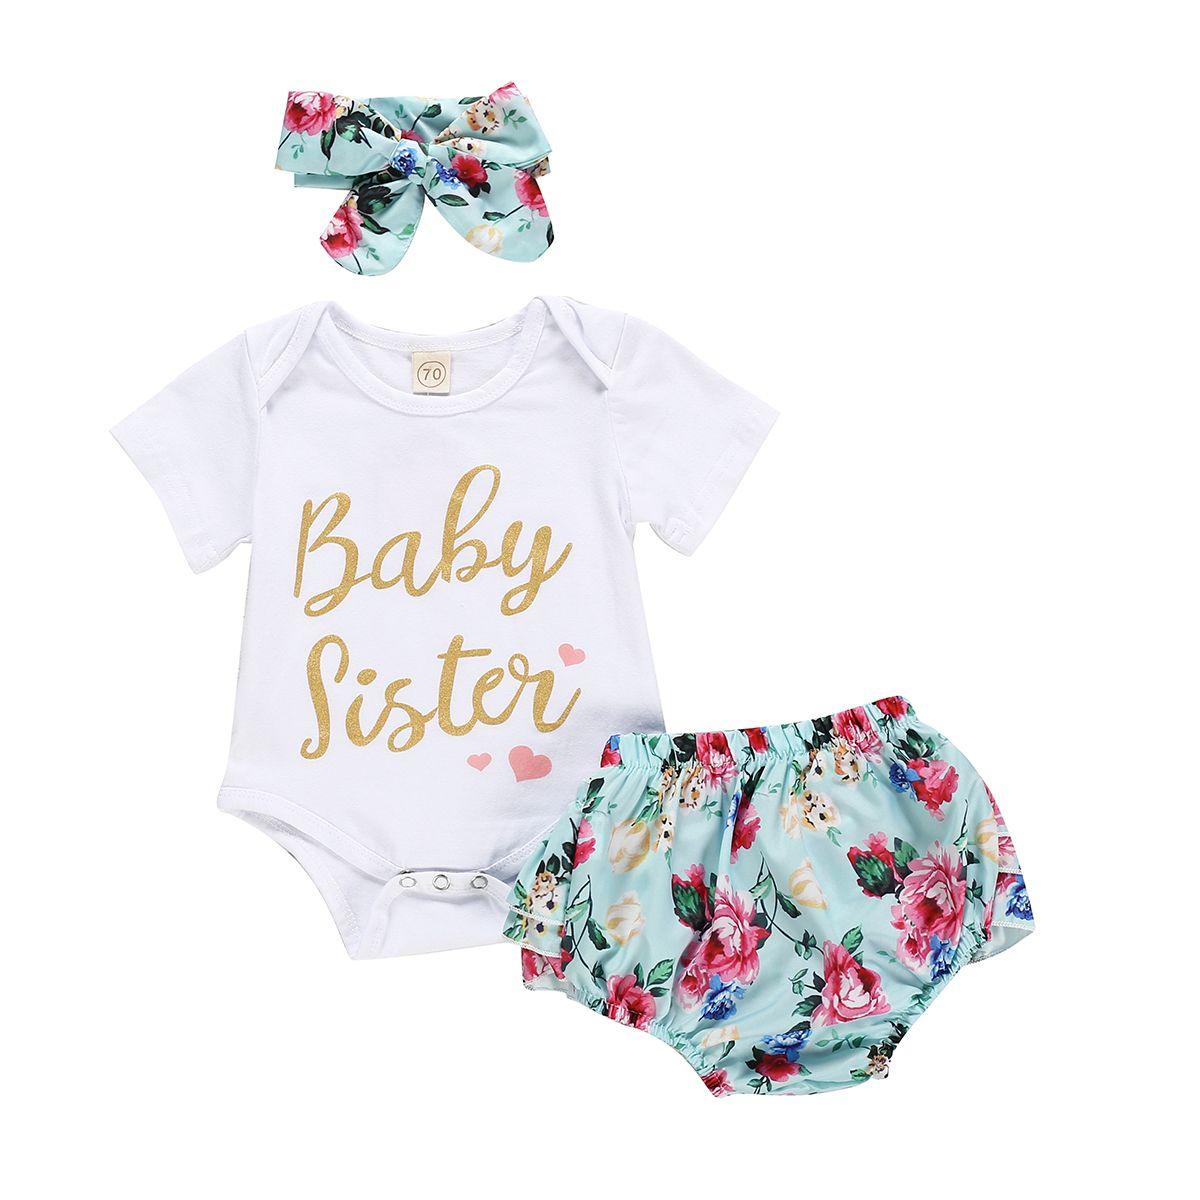 Gajaous Little Sister Summer Short Set Infant Baby Girl Romper Bodysuit+Bloomers Shorts+Headband Outfits Set 0-24M